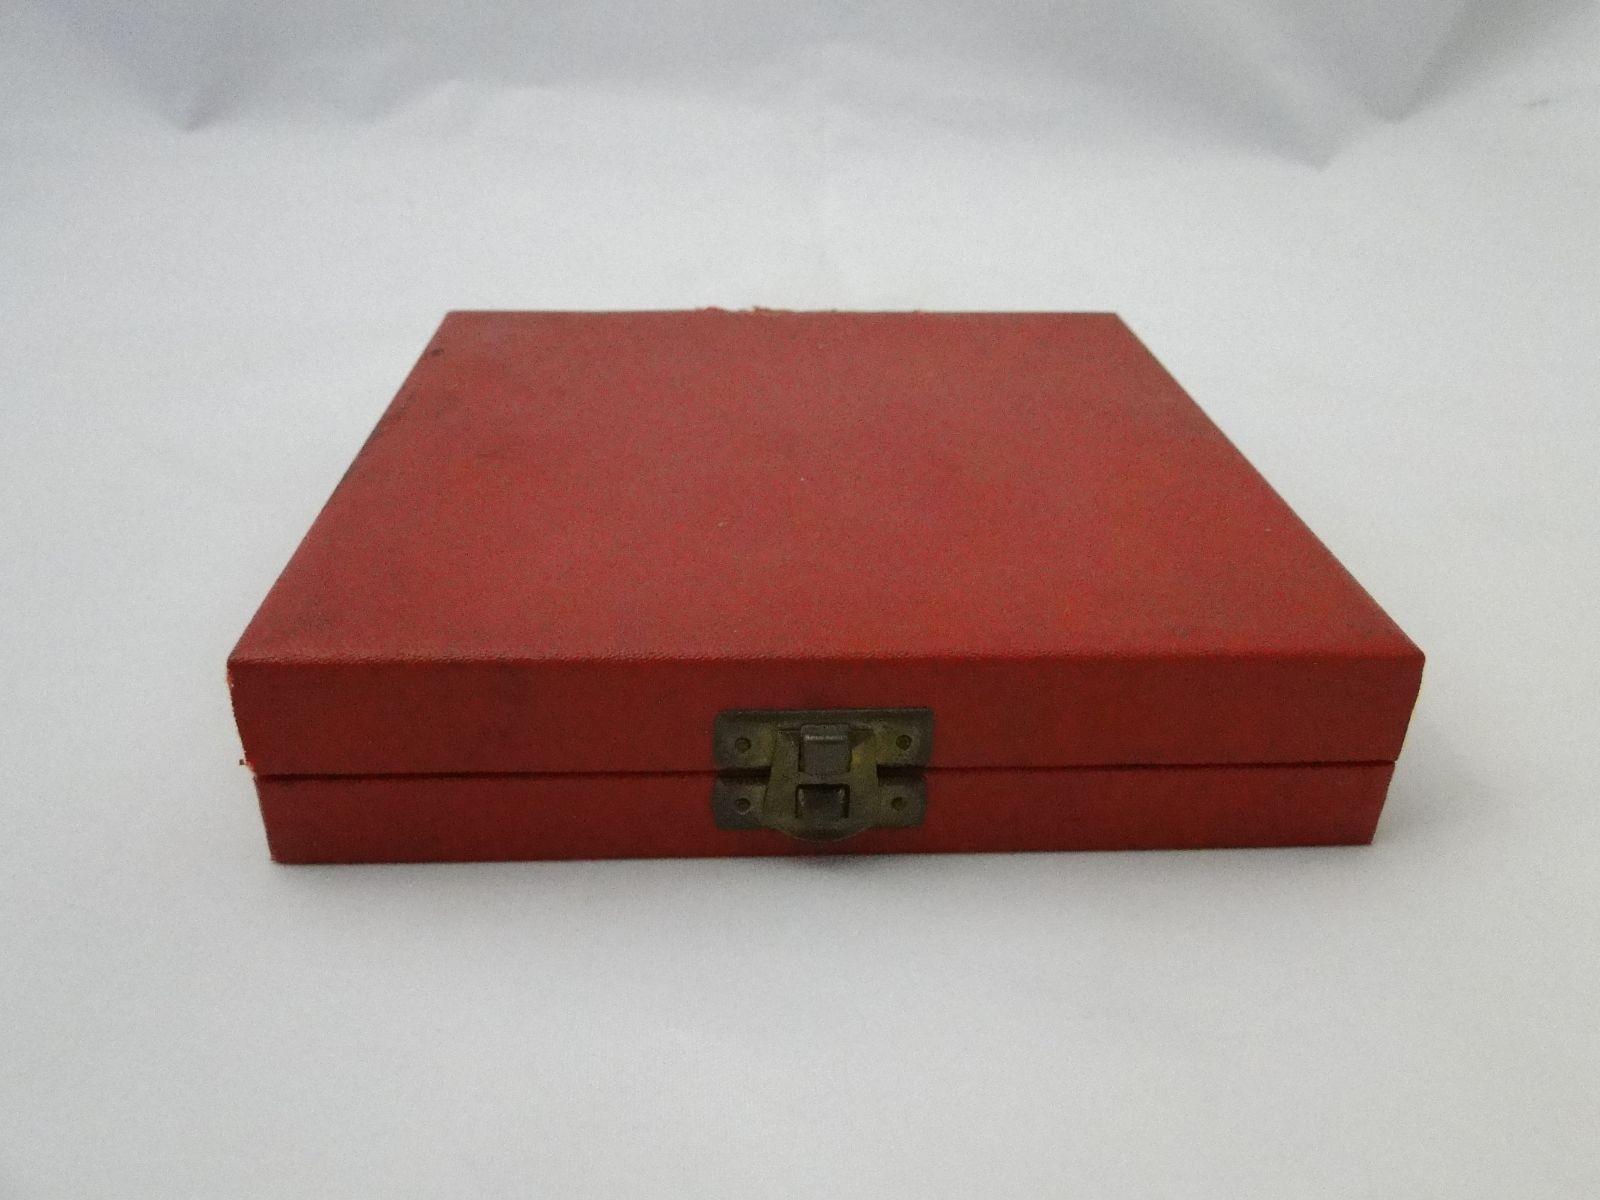 DSC08031.JPG (1600×1200)